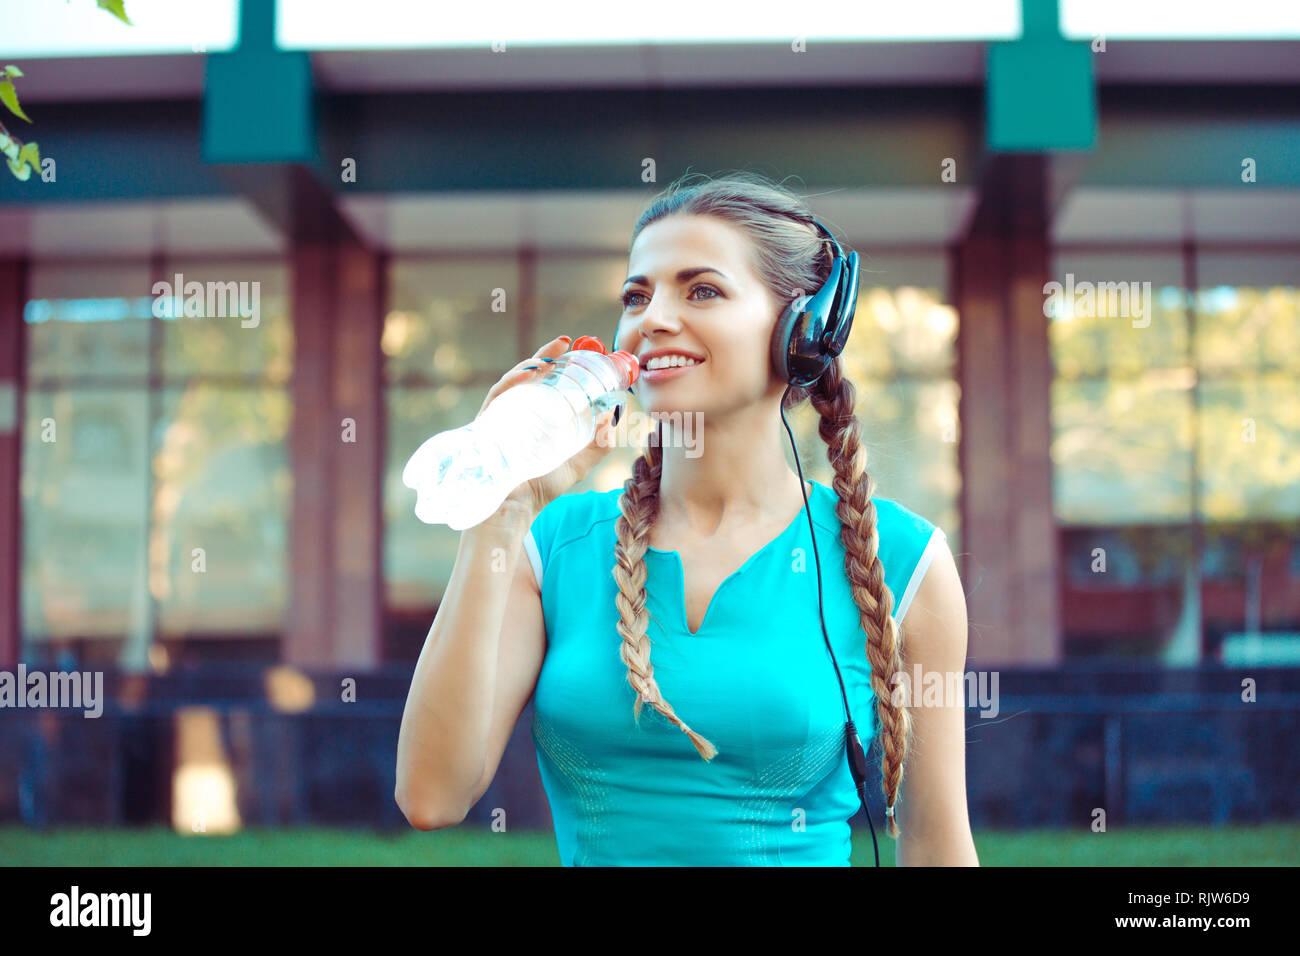 Sportive woman in headphones drinking water - Stock Image